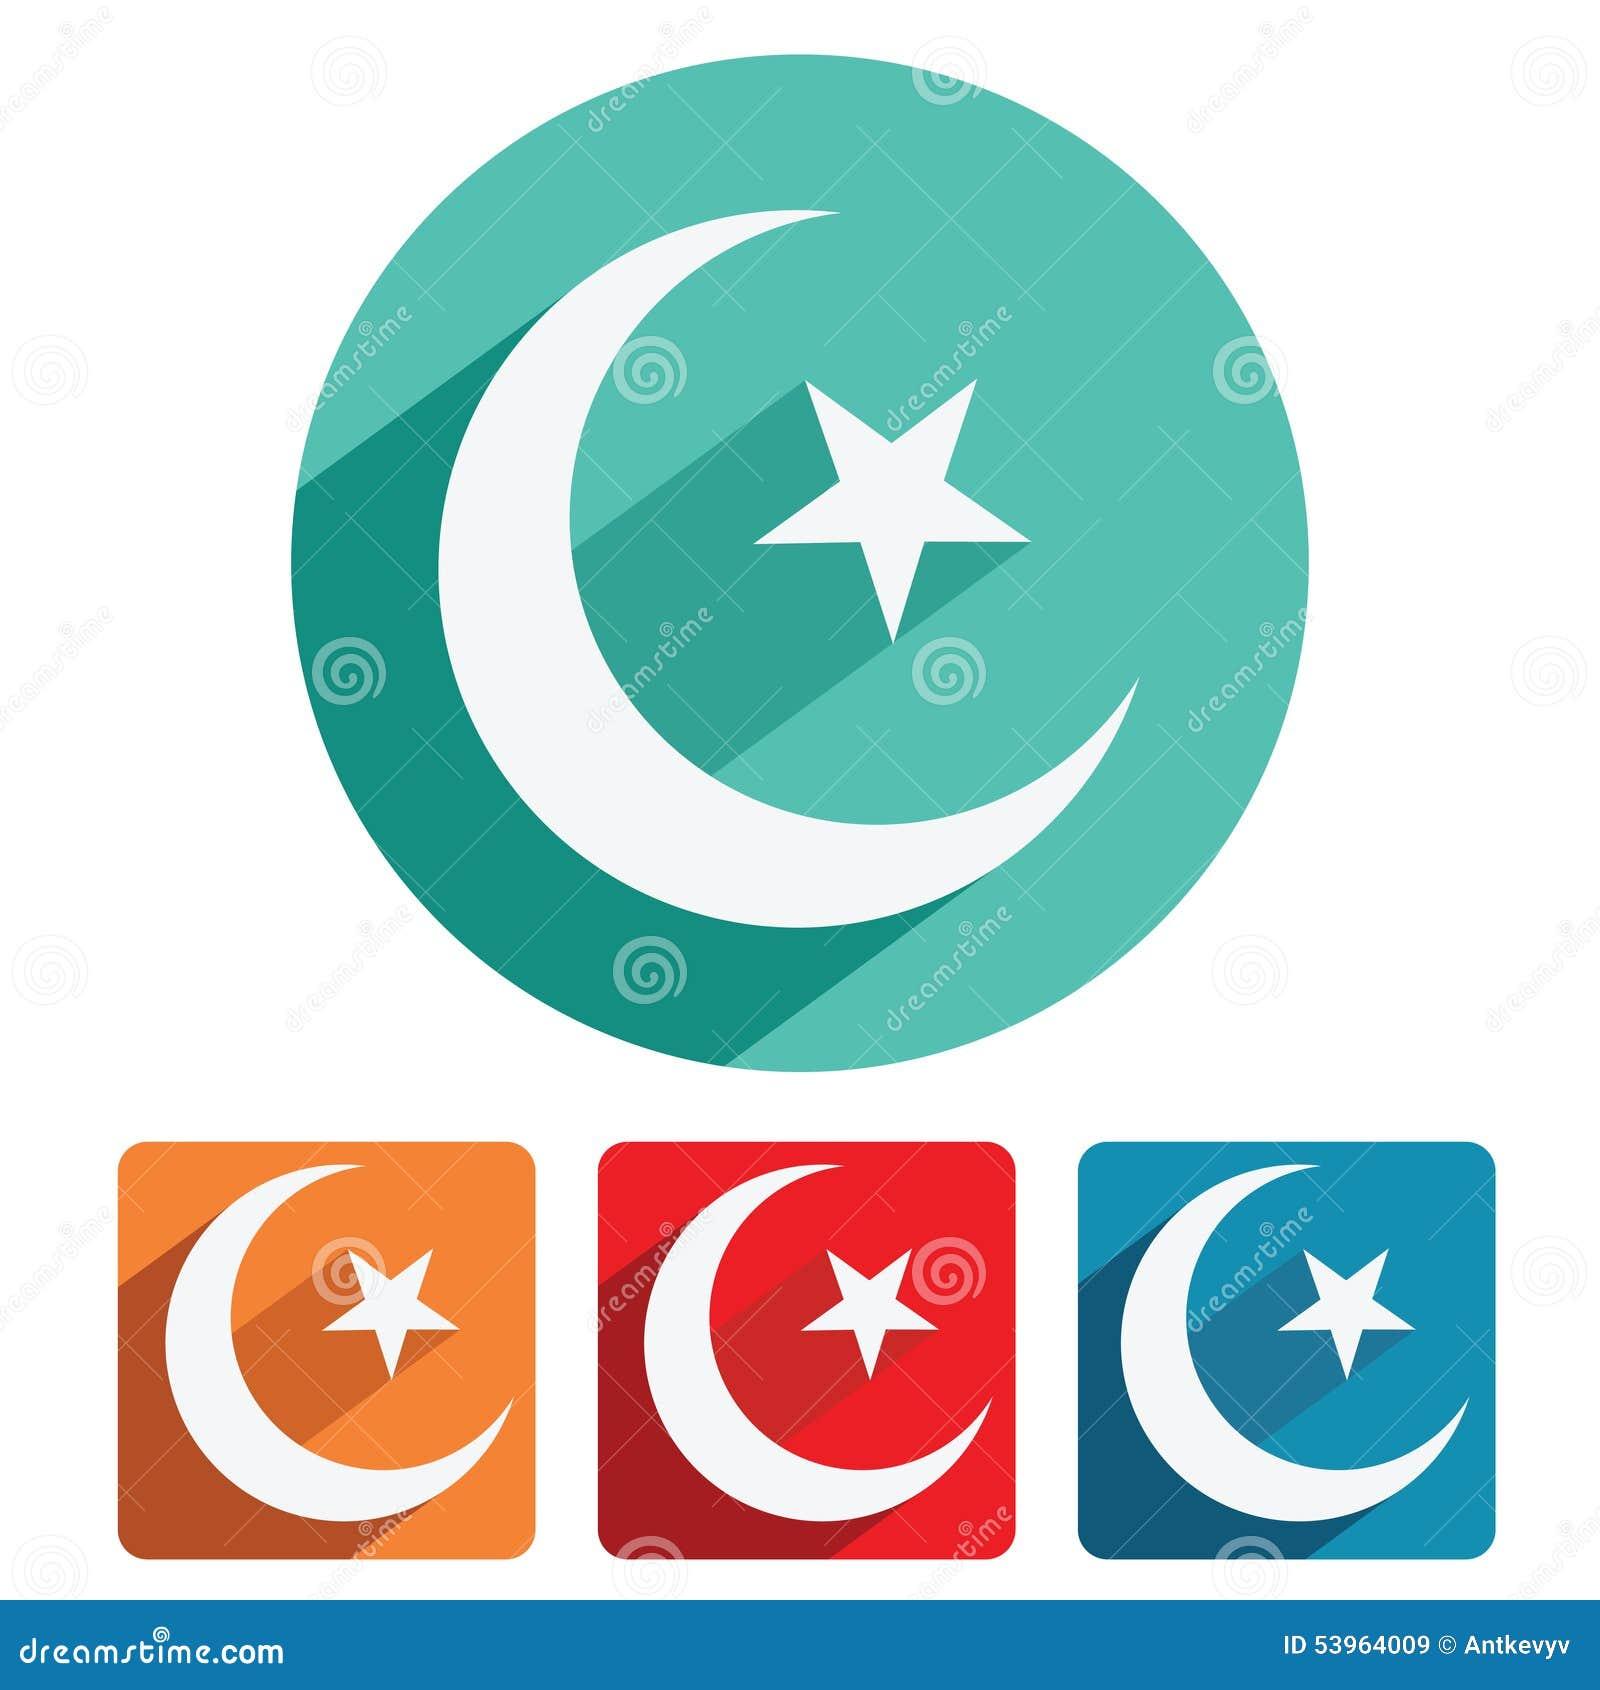 Islam Symbol Icon Flat Design Stock Vector Illustration Of Icon